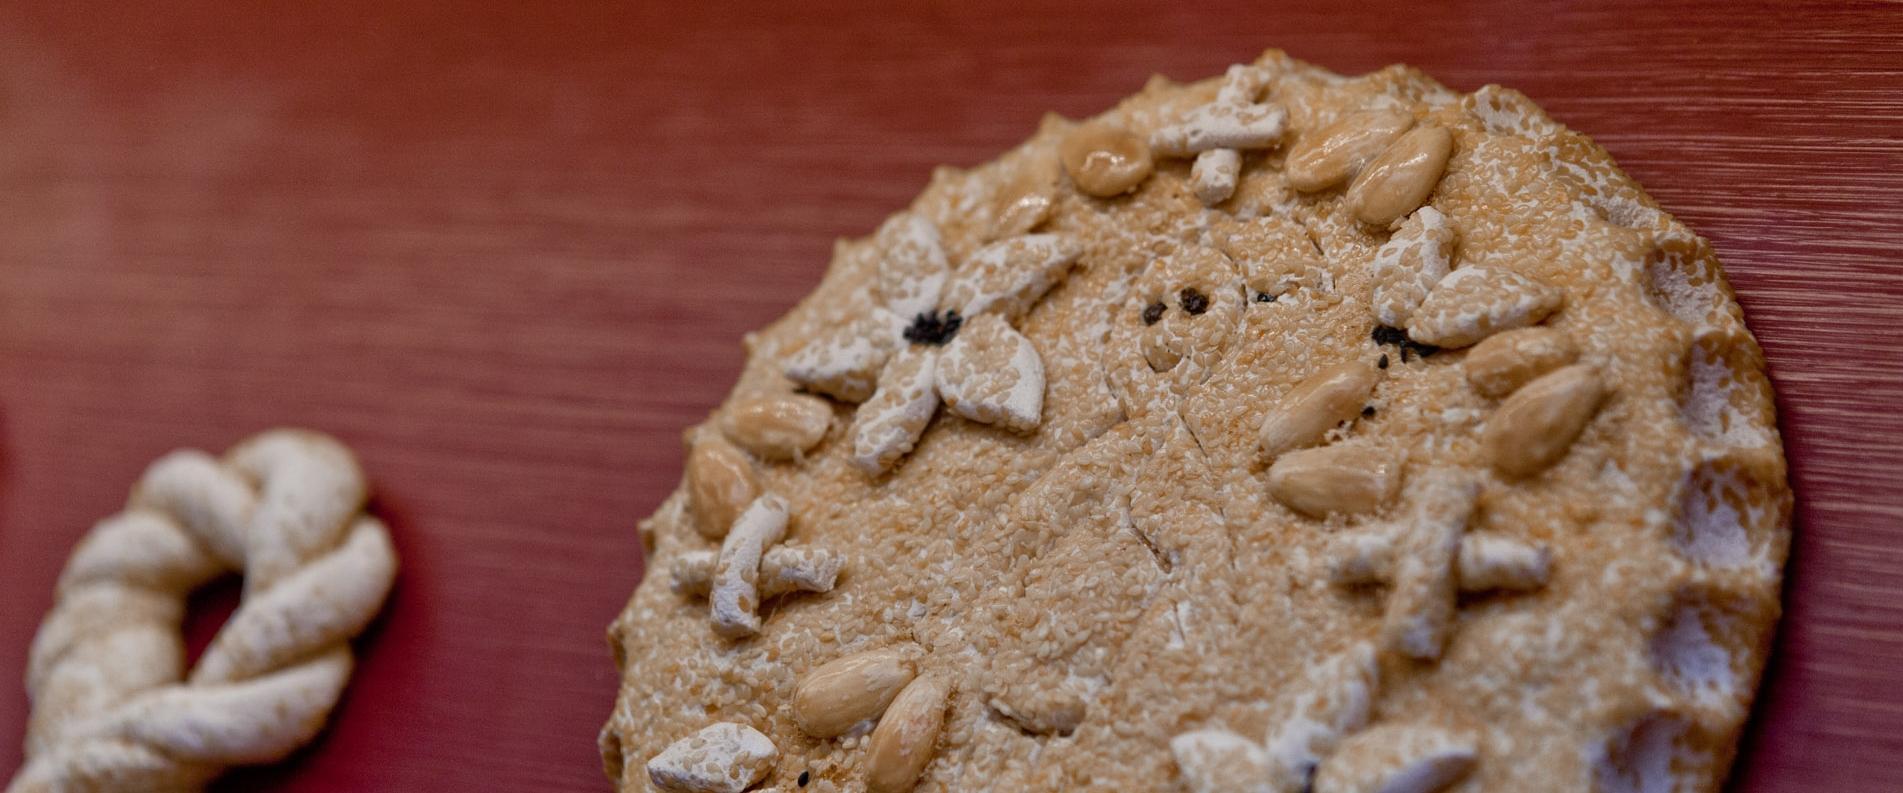 Bread Museum in Limassol